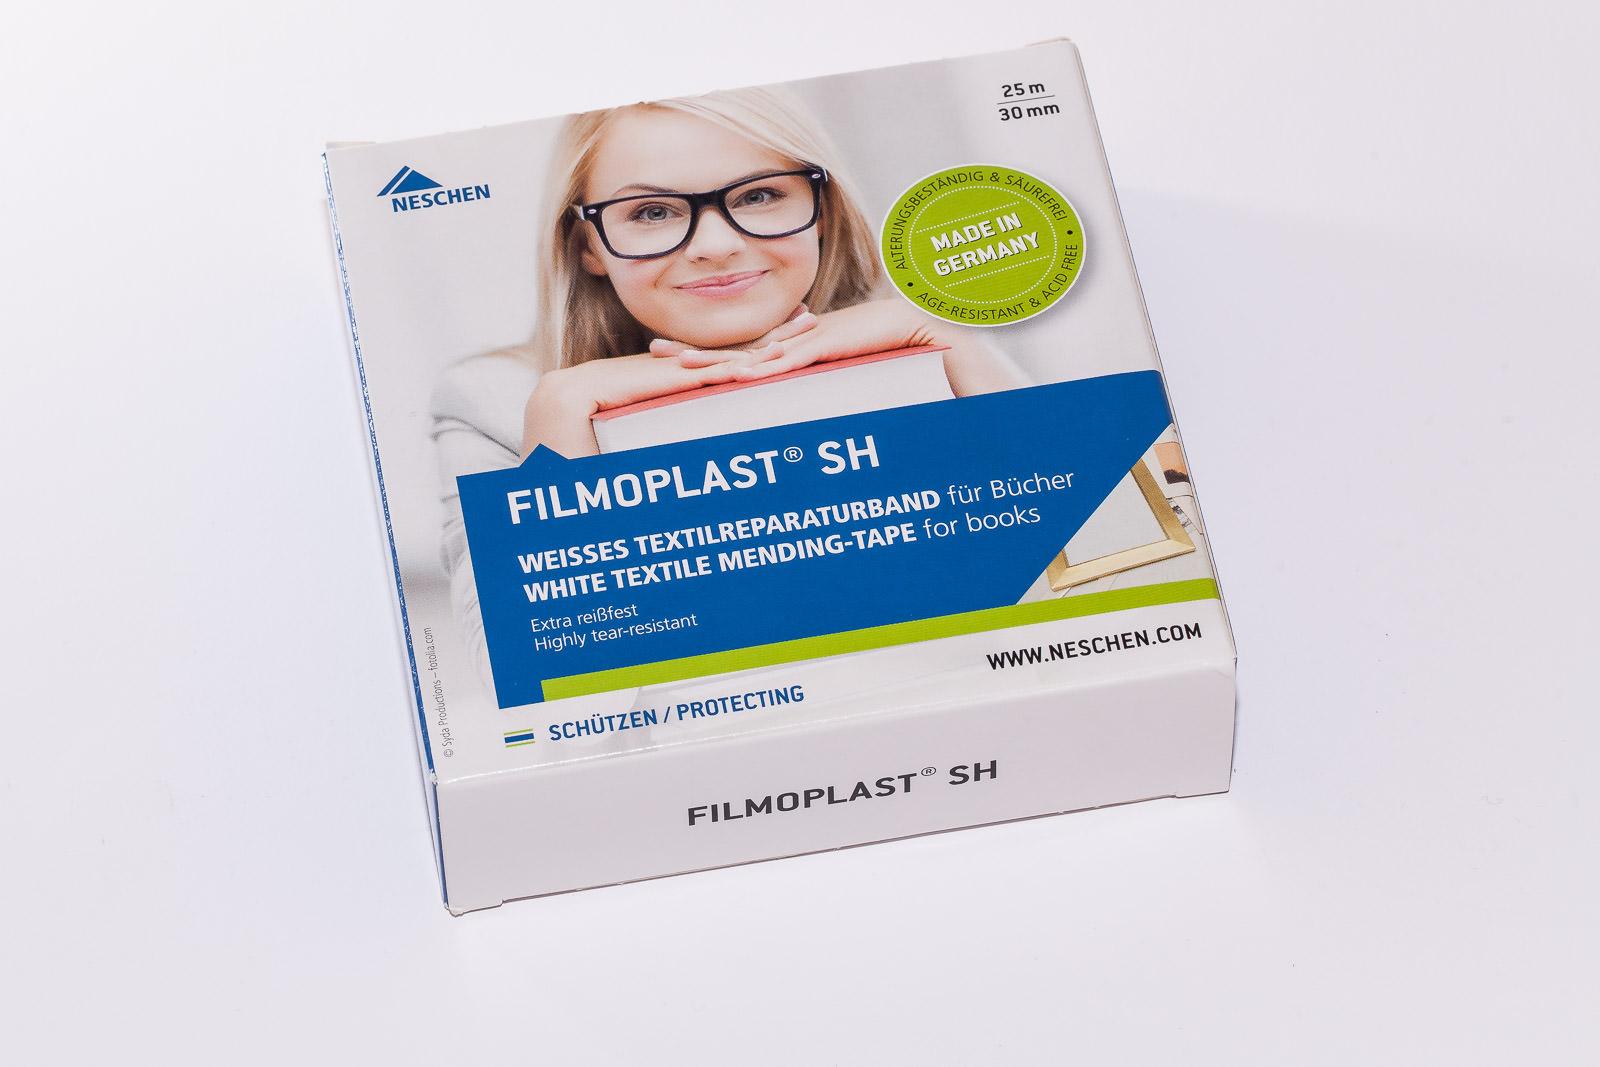 Filmoplast SH